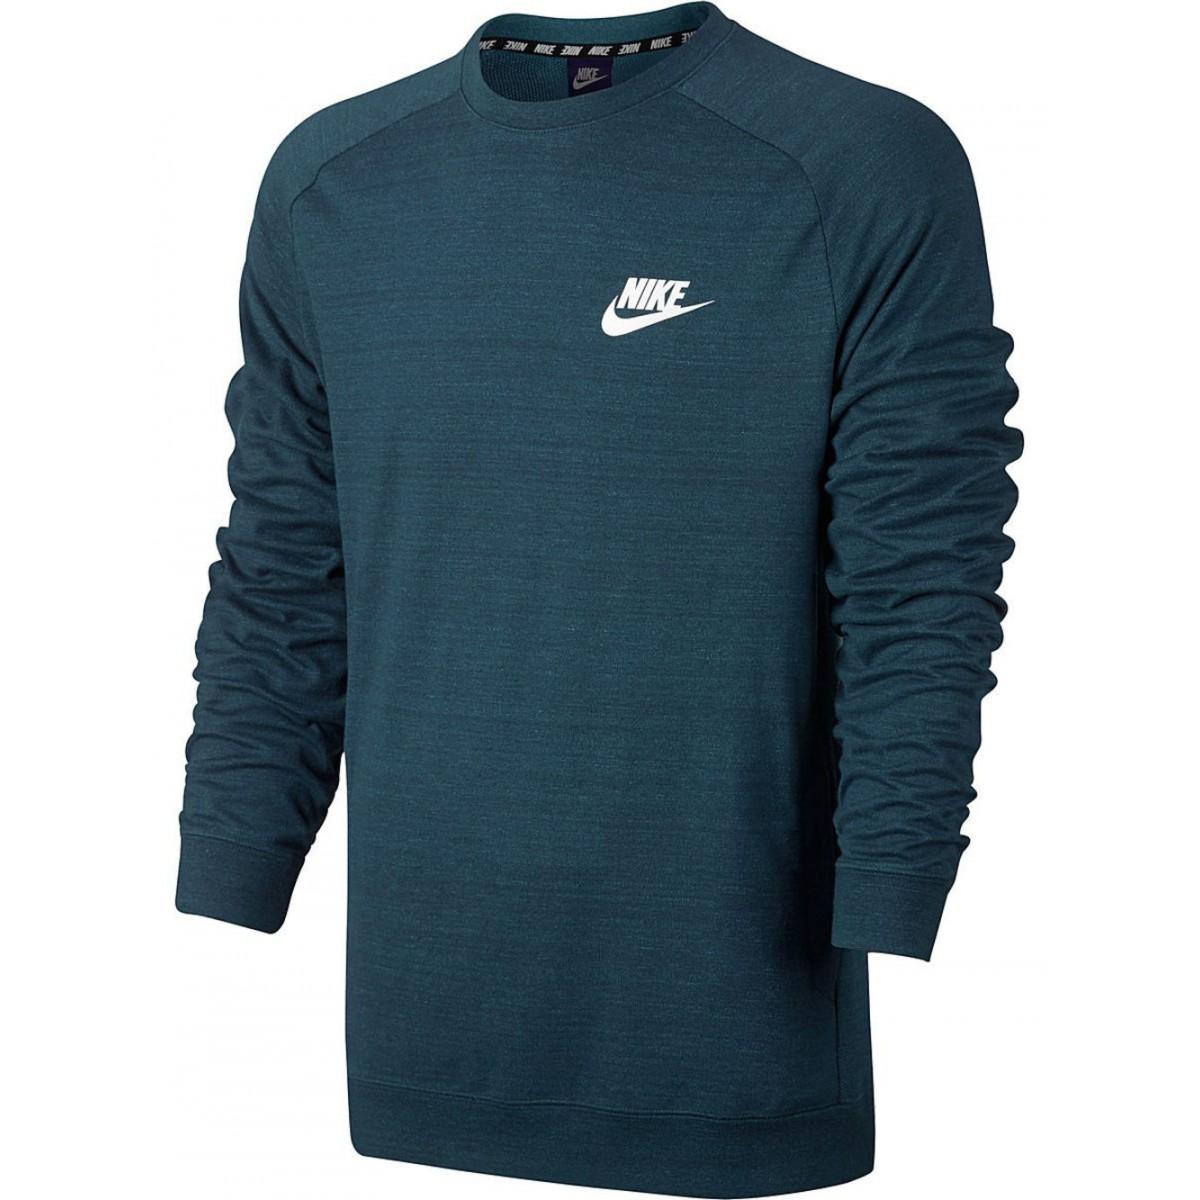 Nike 15 Advance 15 Nike Sweat Advance Crew Sweat Sweat Crew rxWdCBoeQ